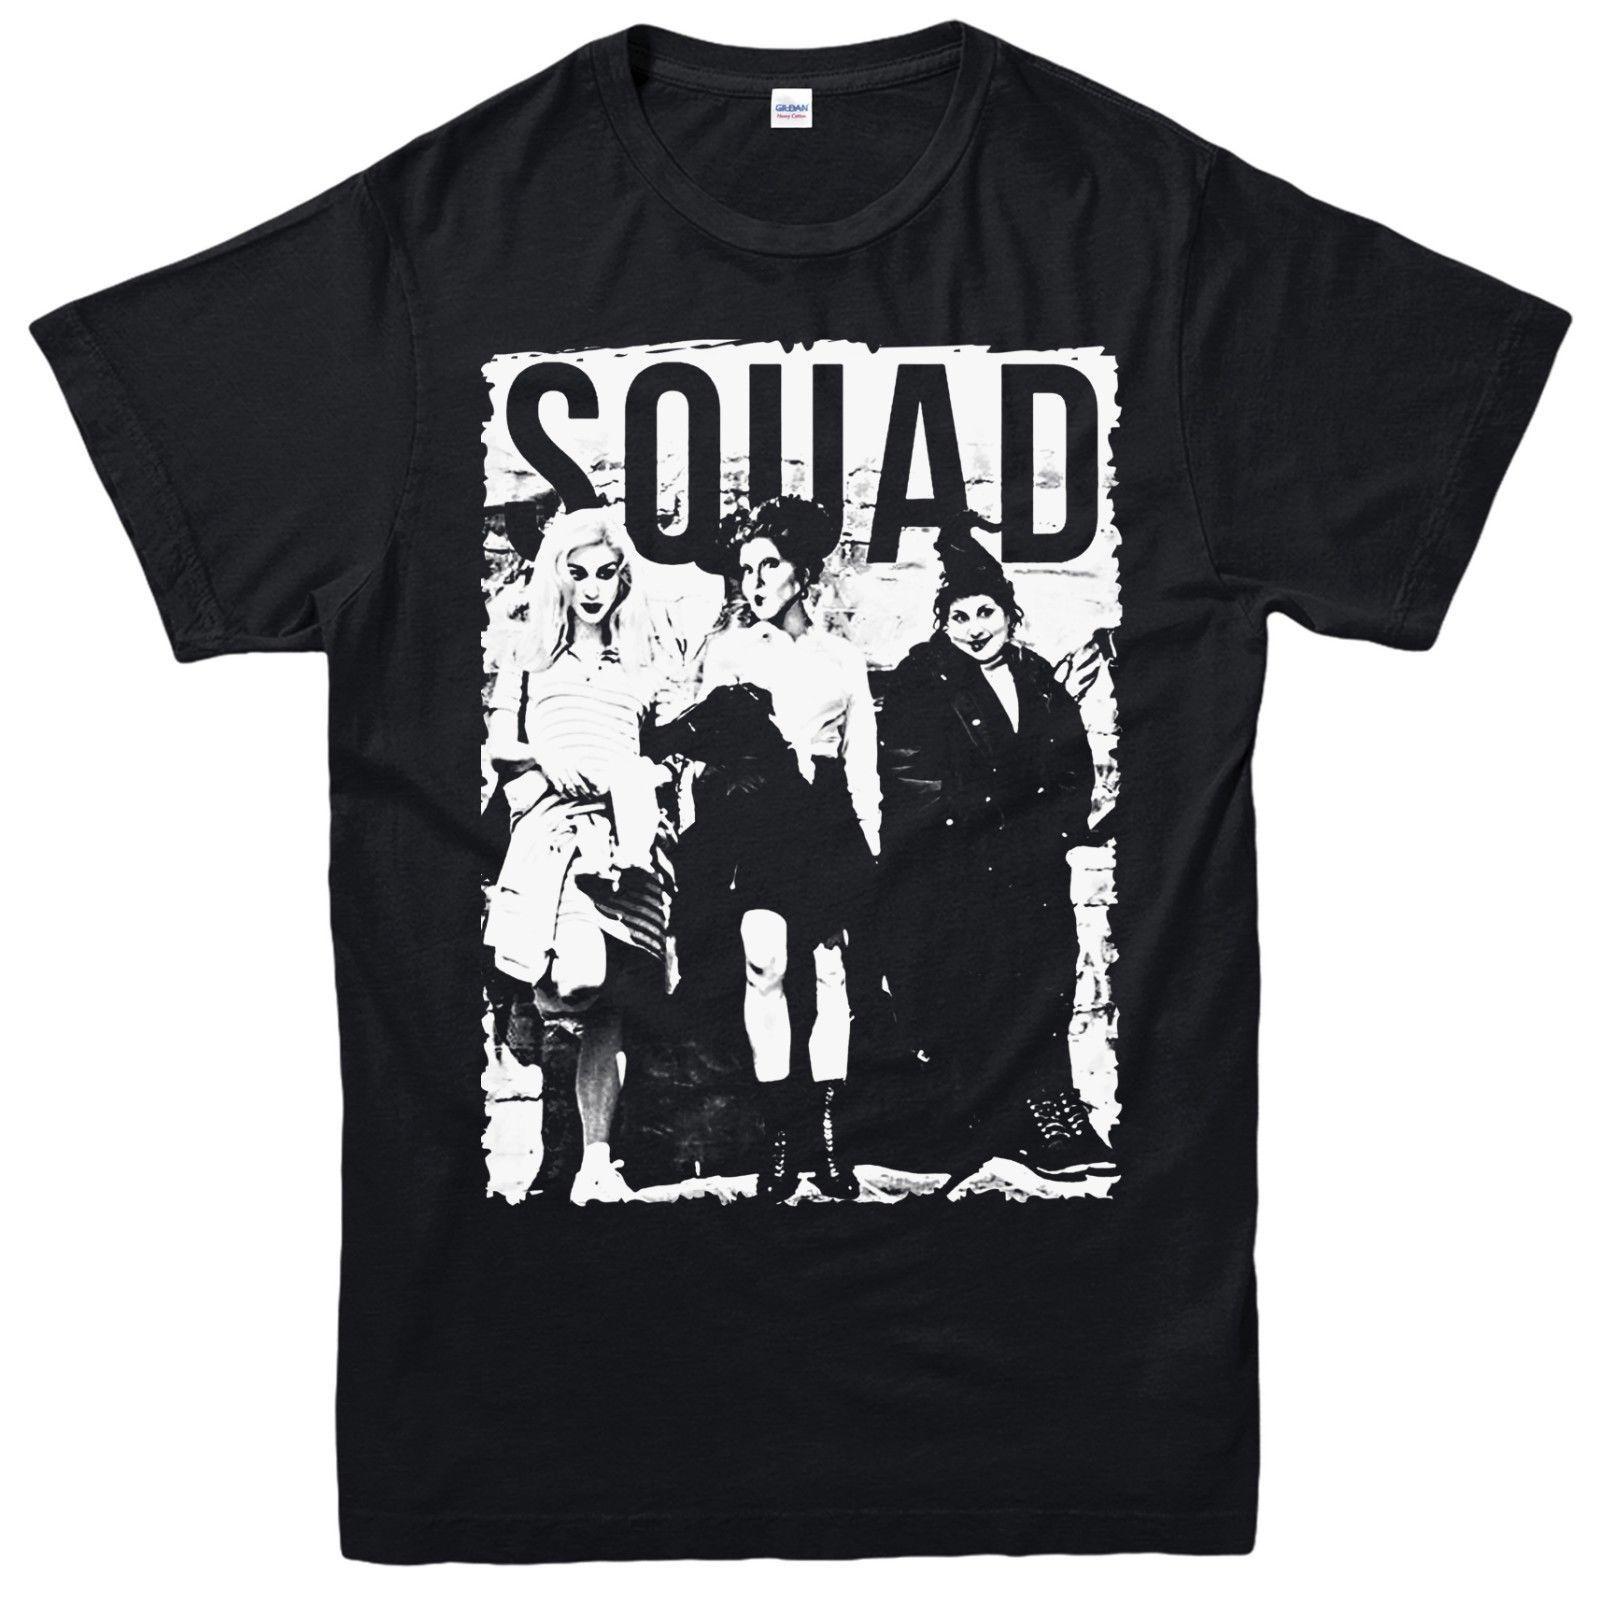 Camiseta de Squad Hocus Pocus Movie Halloween para adultos y niños camiseta Cool Casual pride t shirt hombres Unisex nuevo